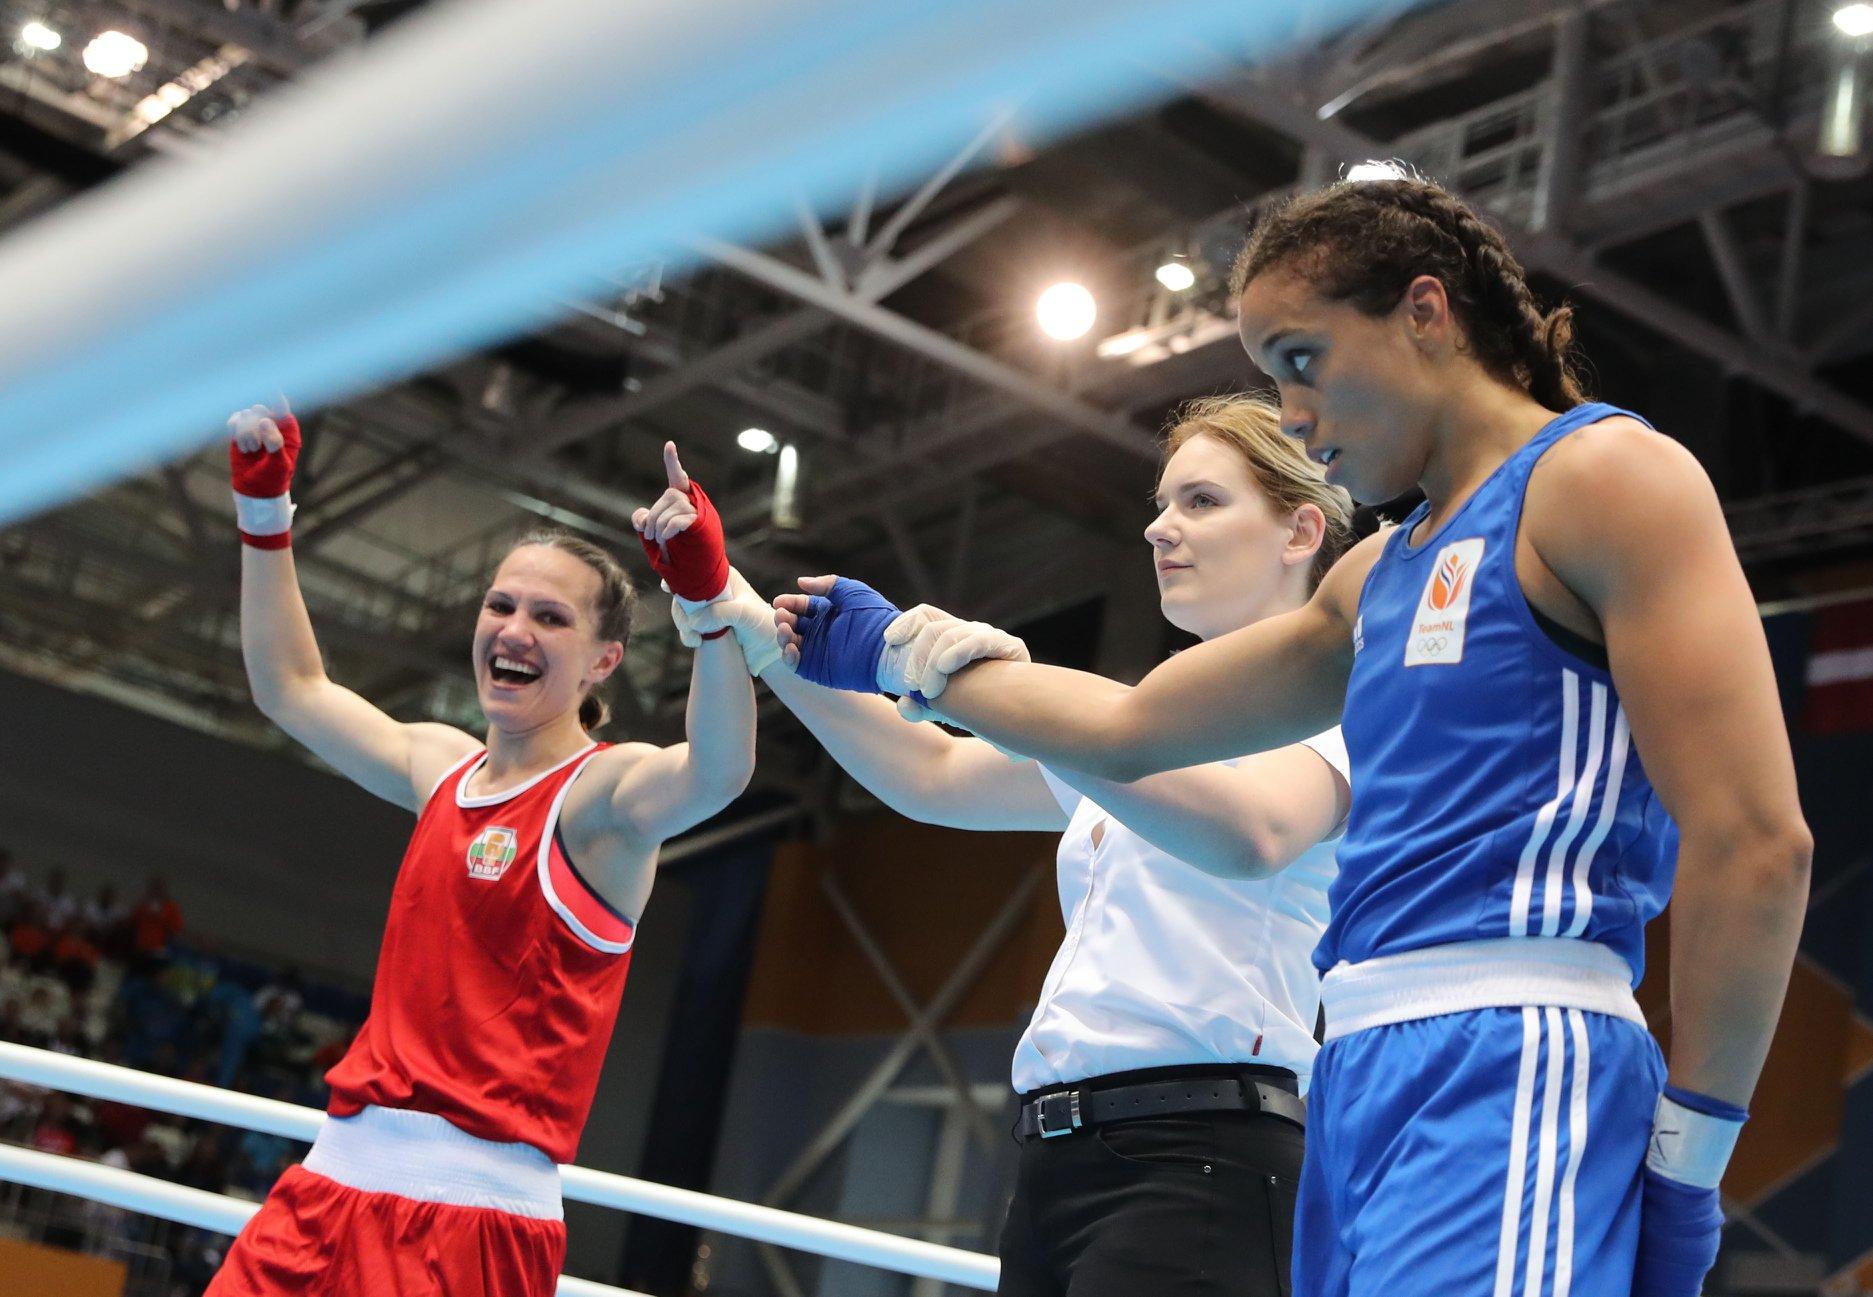 Станимира Петрова е на финал на Европейските игри!